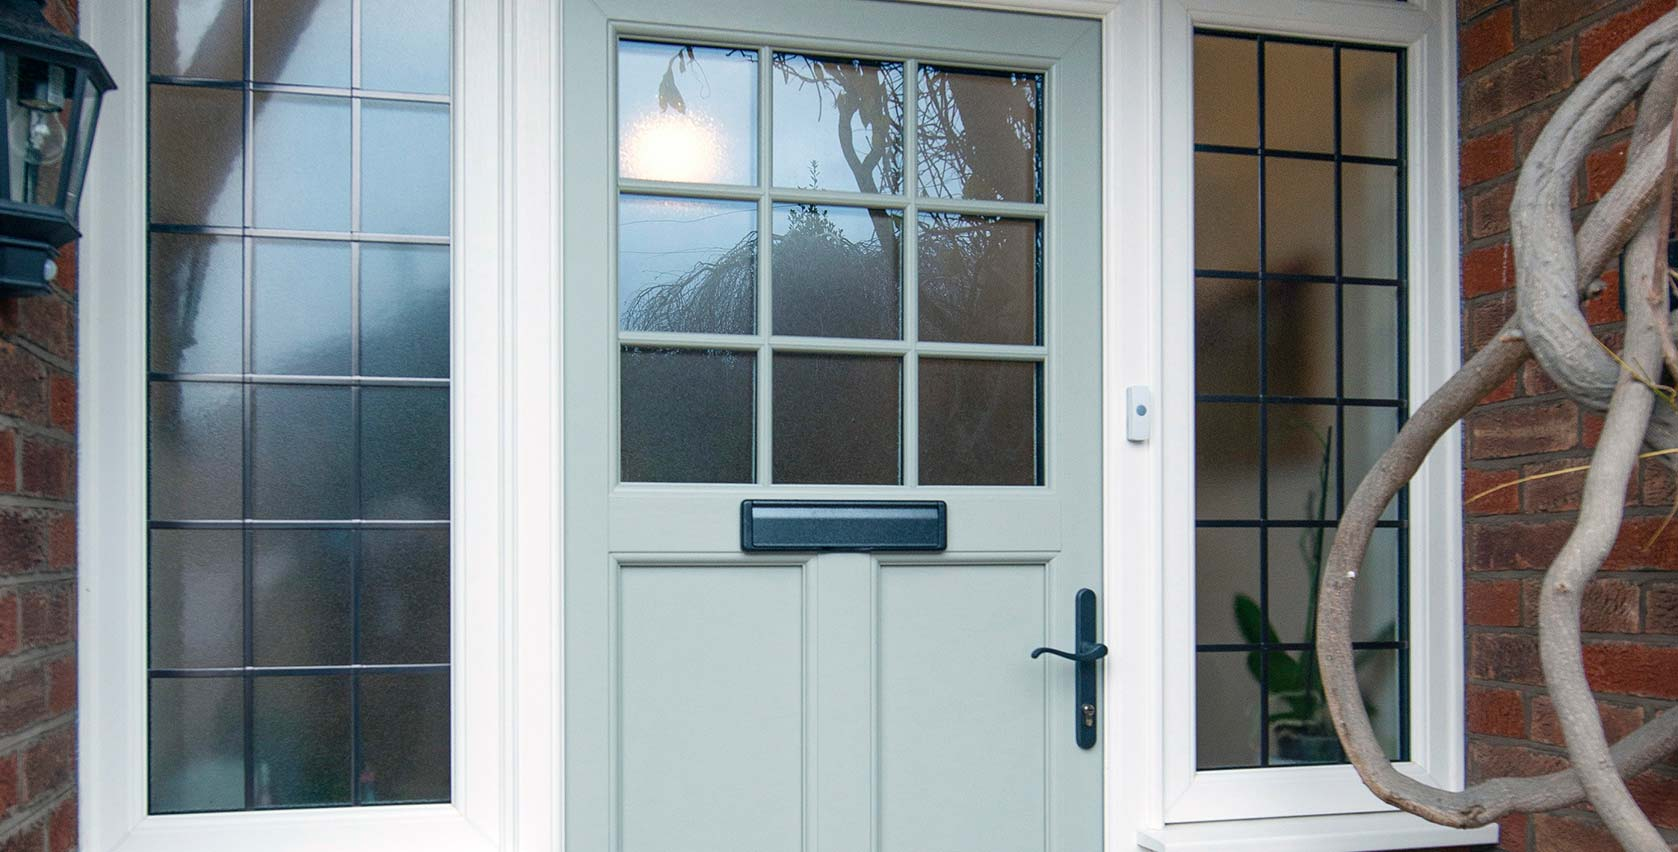 Suffolk Door Collection The Ixworth & Suffolk Door Collection - Express Your Personality - PVC-u Doors